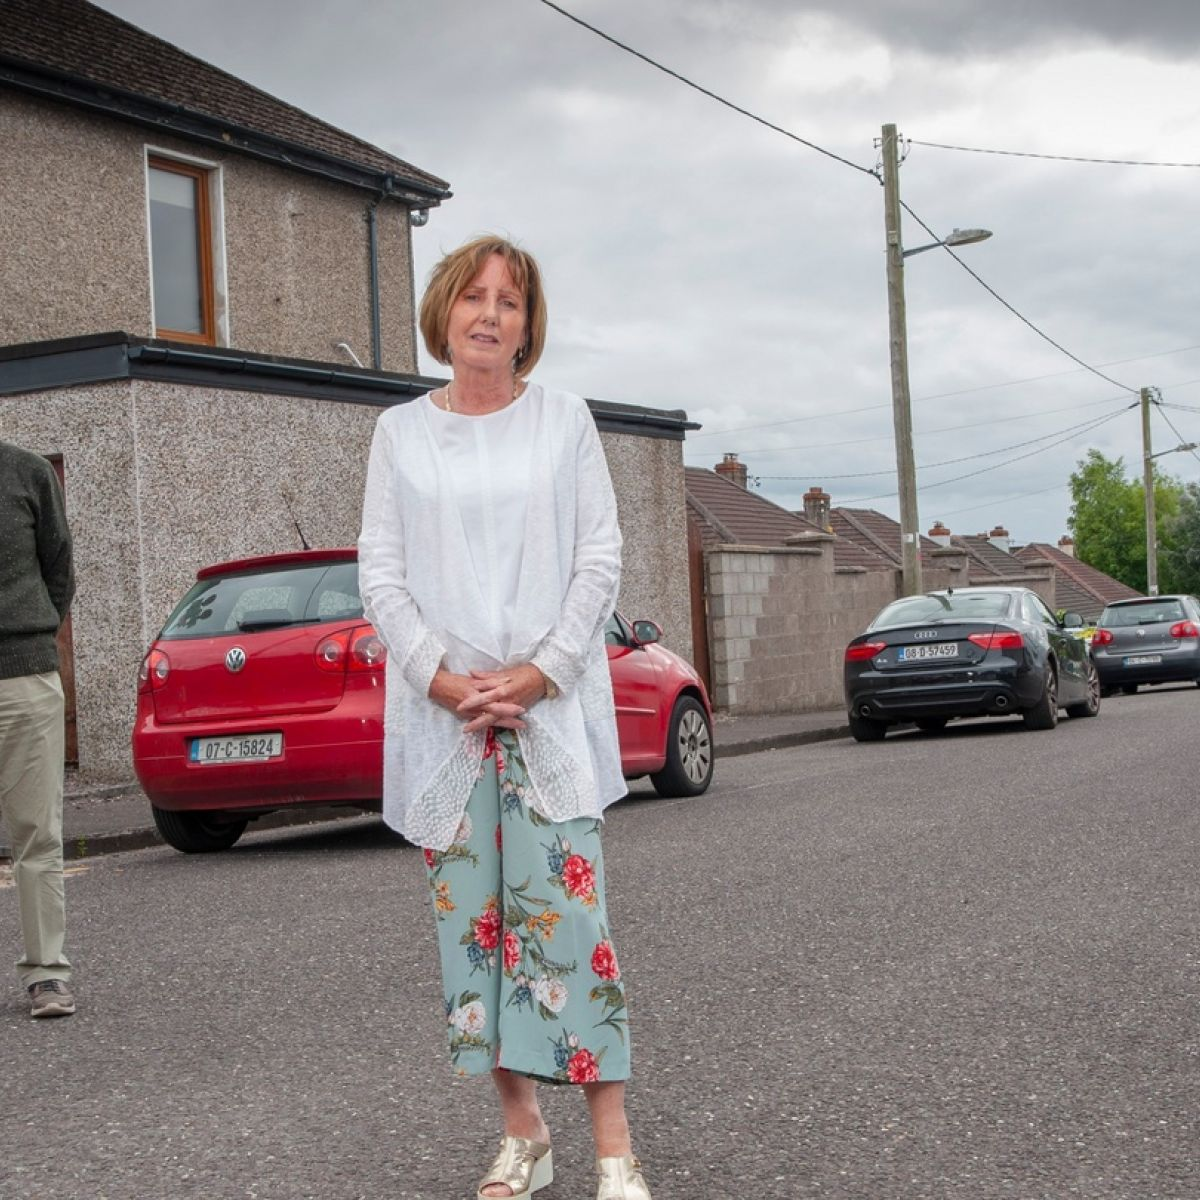 Cork Mature Dating Site, Cork Mature Personals, Mature